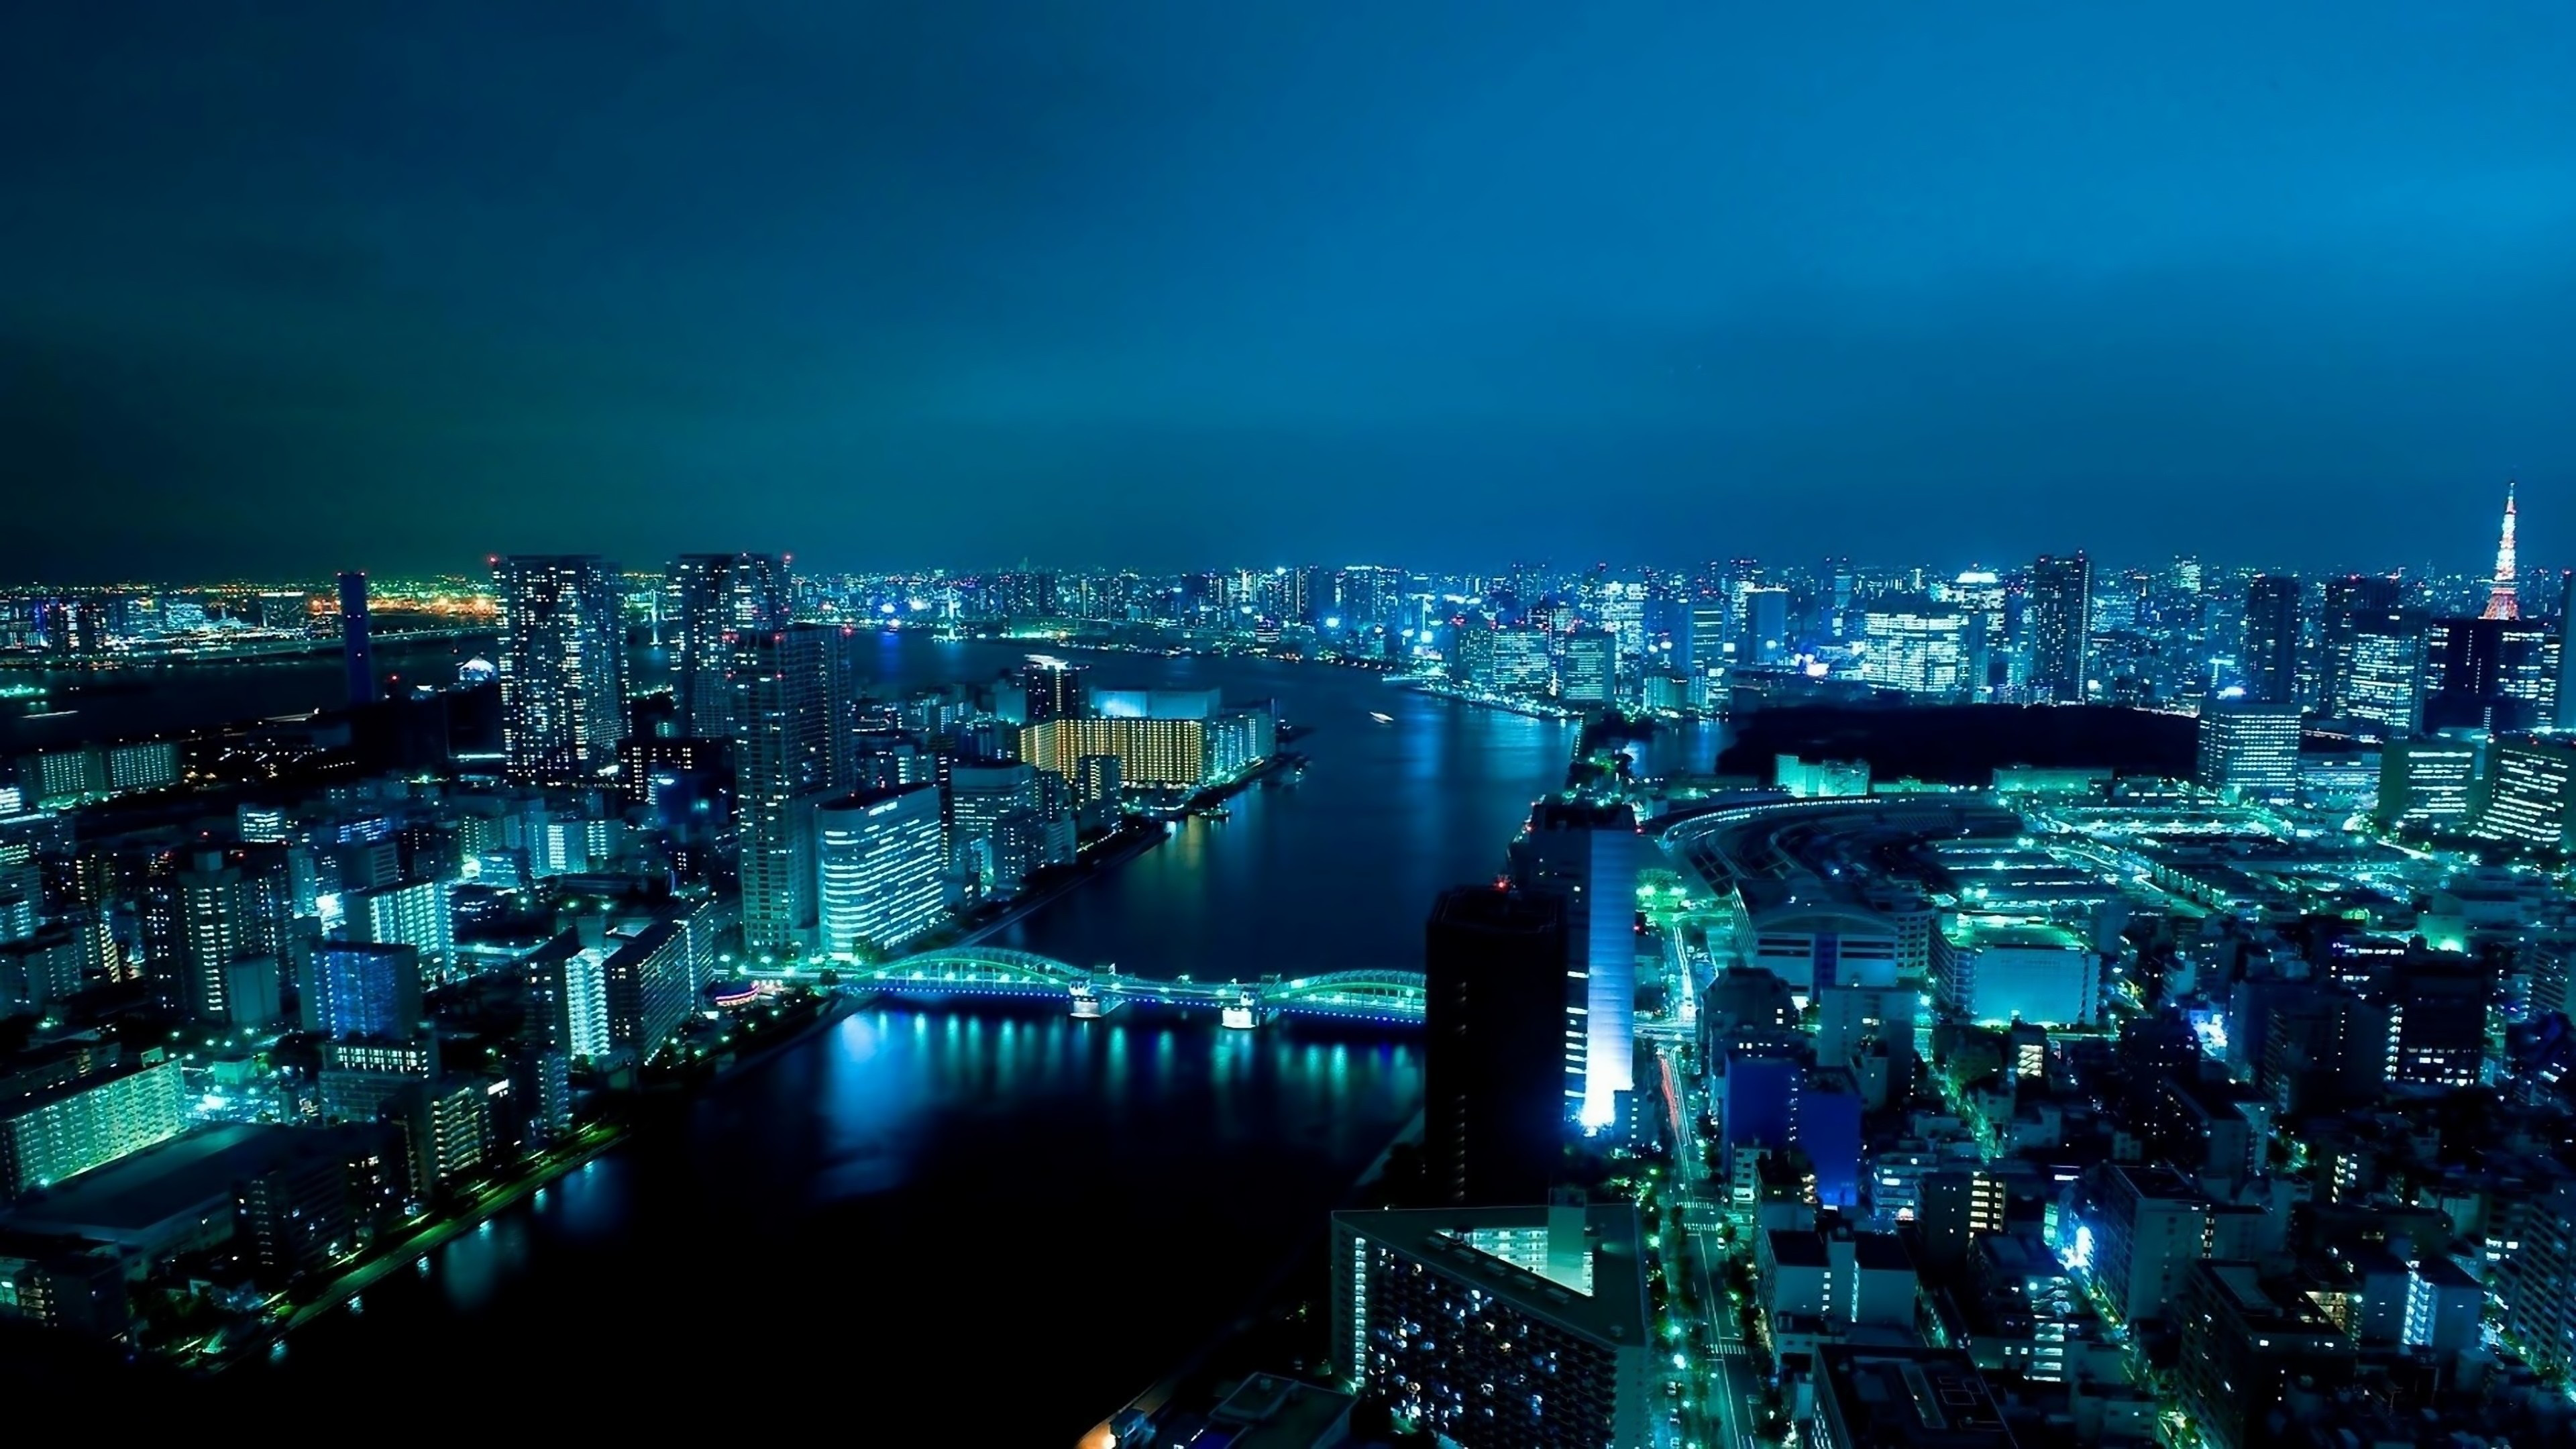 At Night Japan Wallpapers Windows 8 Desktop Wallpapers Widescreen 3840x2160